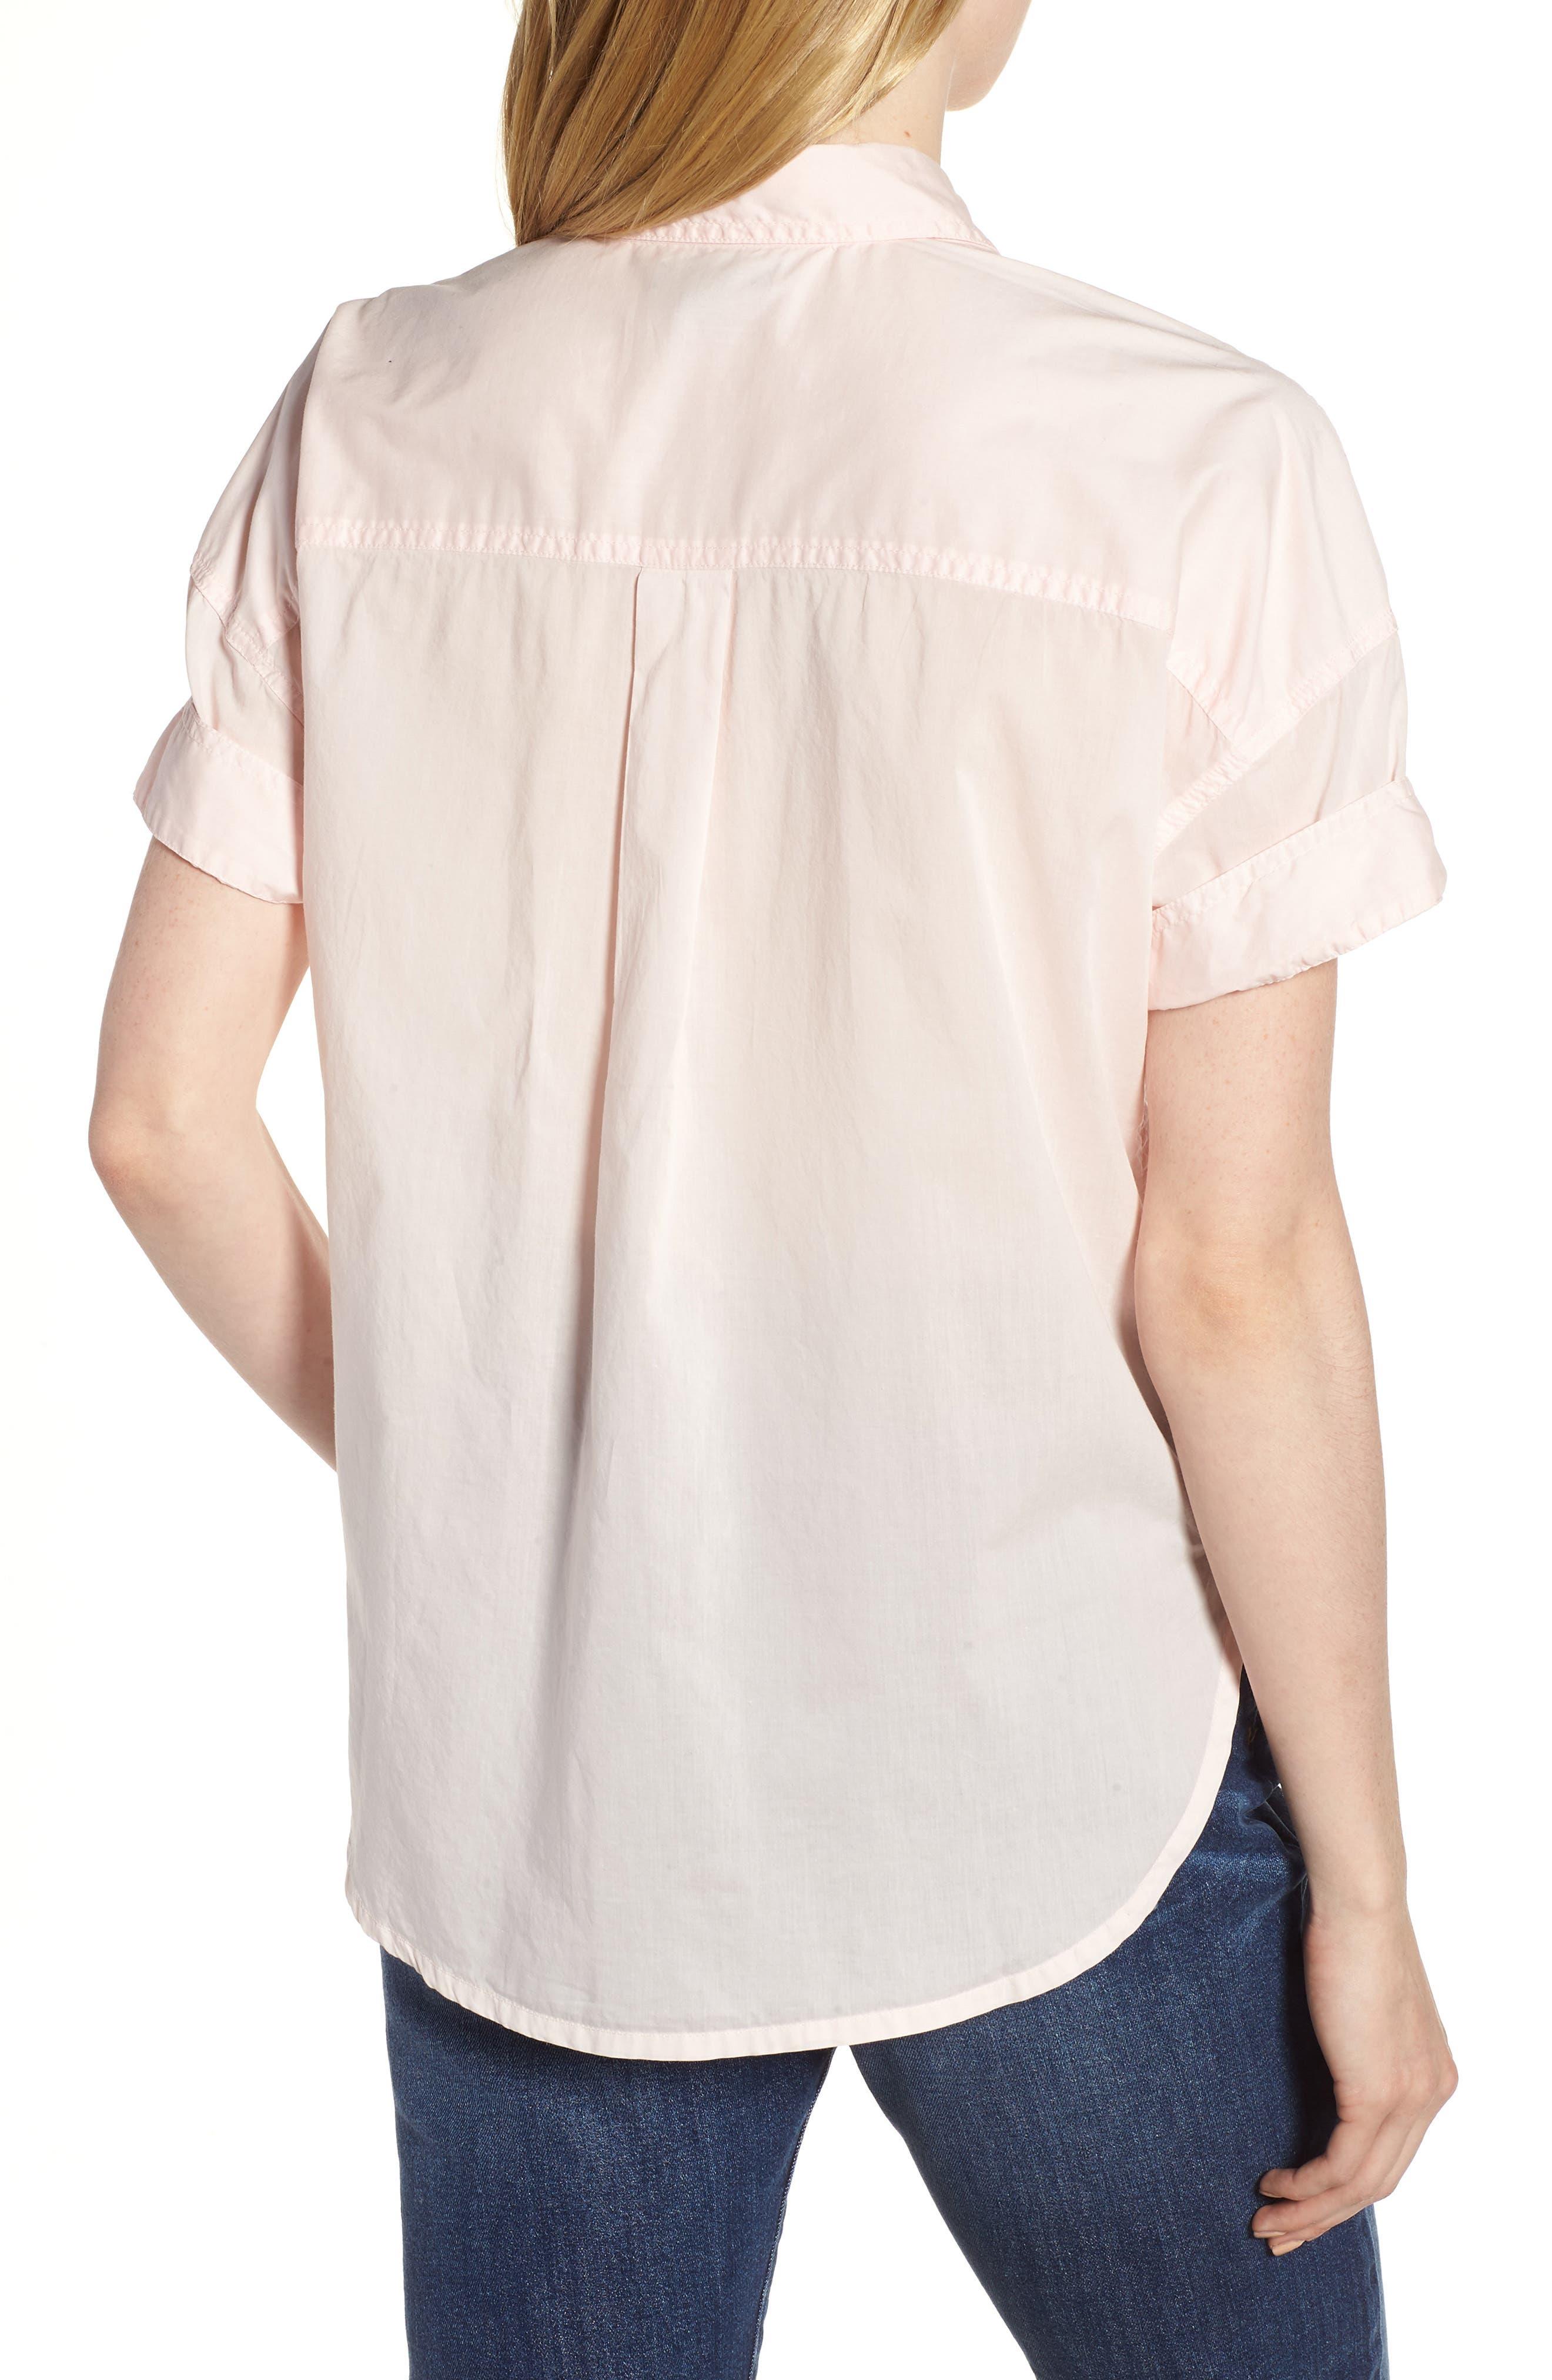 J.Crew Utility Pocket Shirt,                             Alternate thumbnail 4, color,                             Pastel Pink